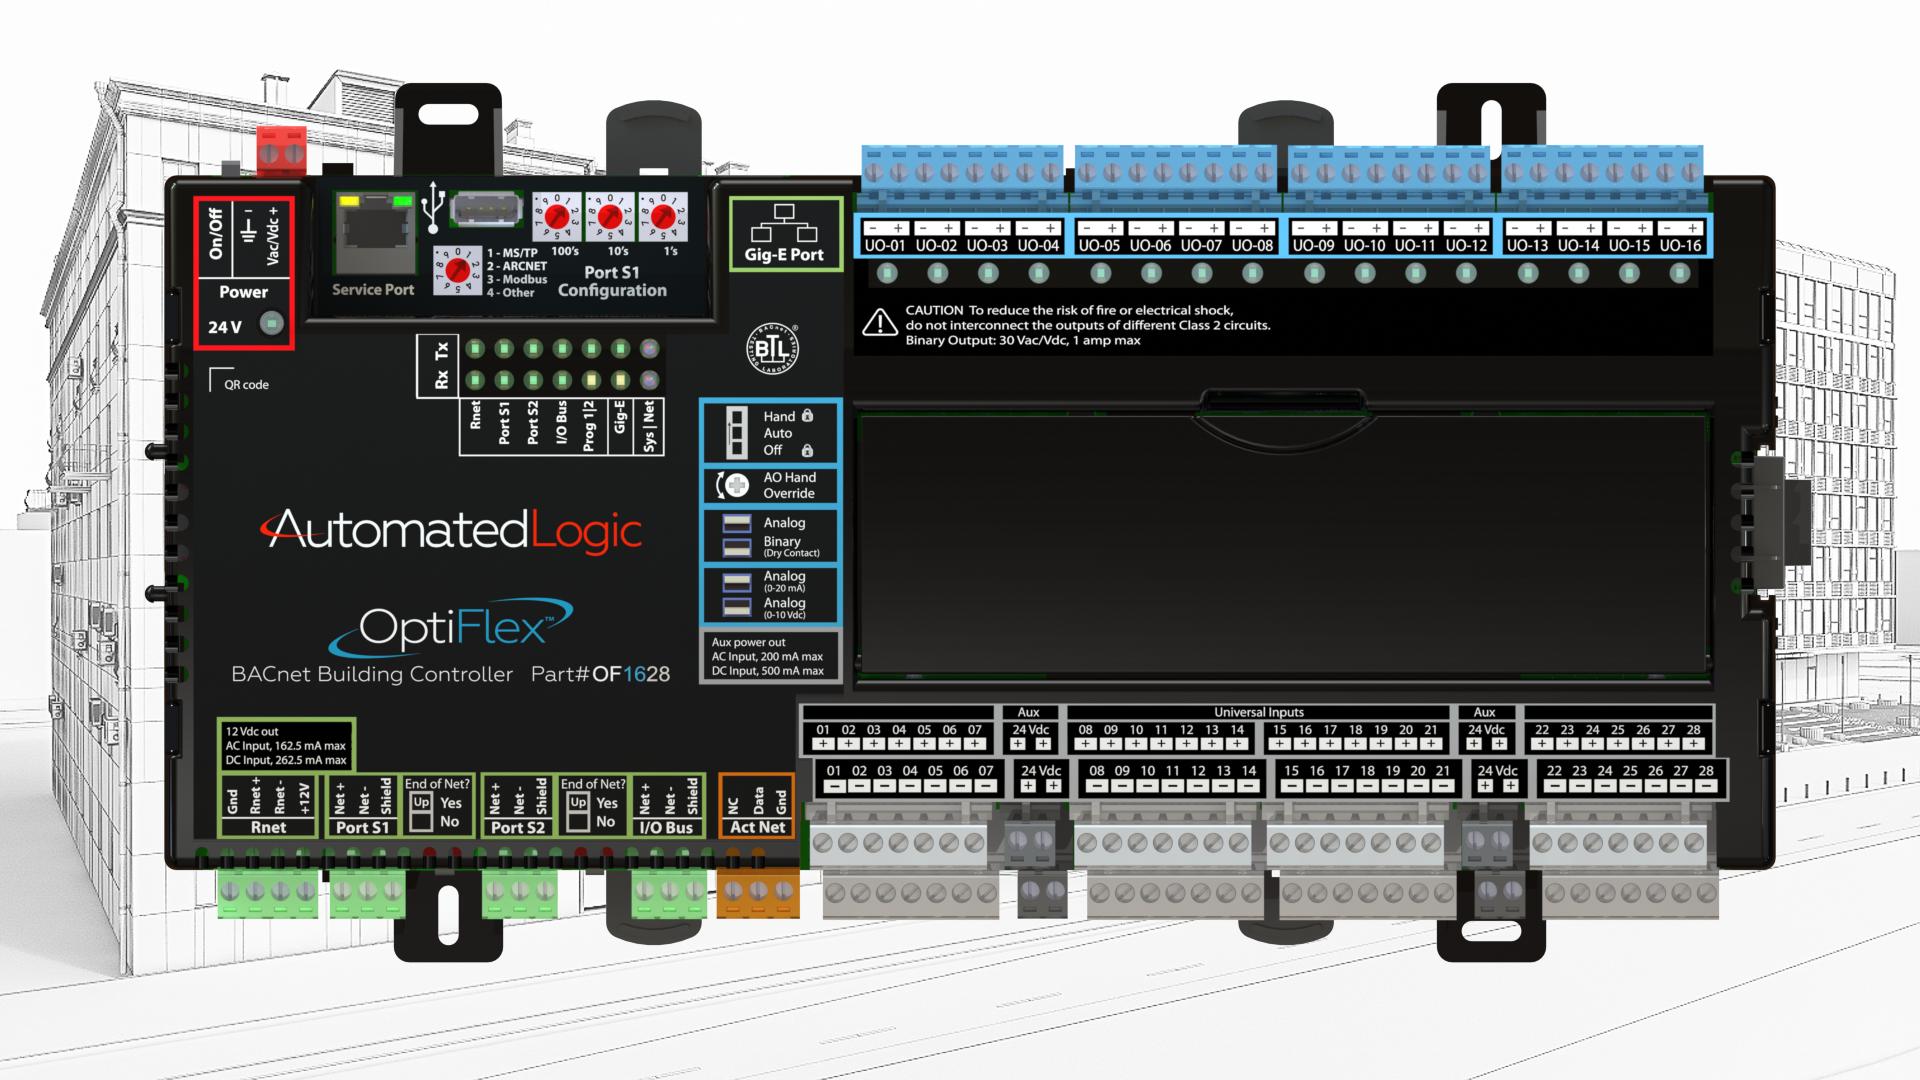 OptiFlex-BACnet-Building-Controller-OF1628